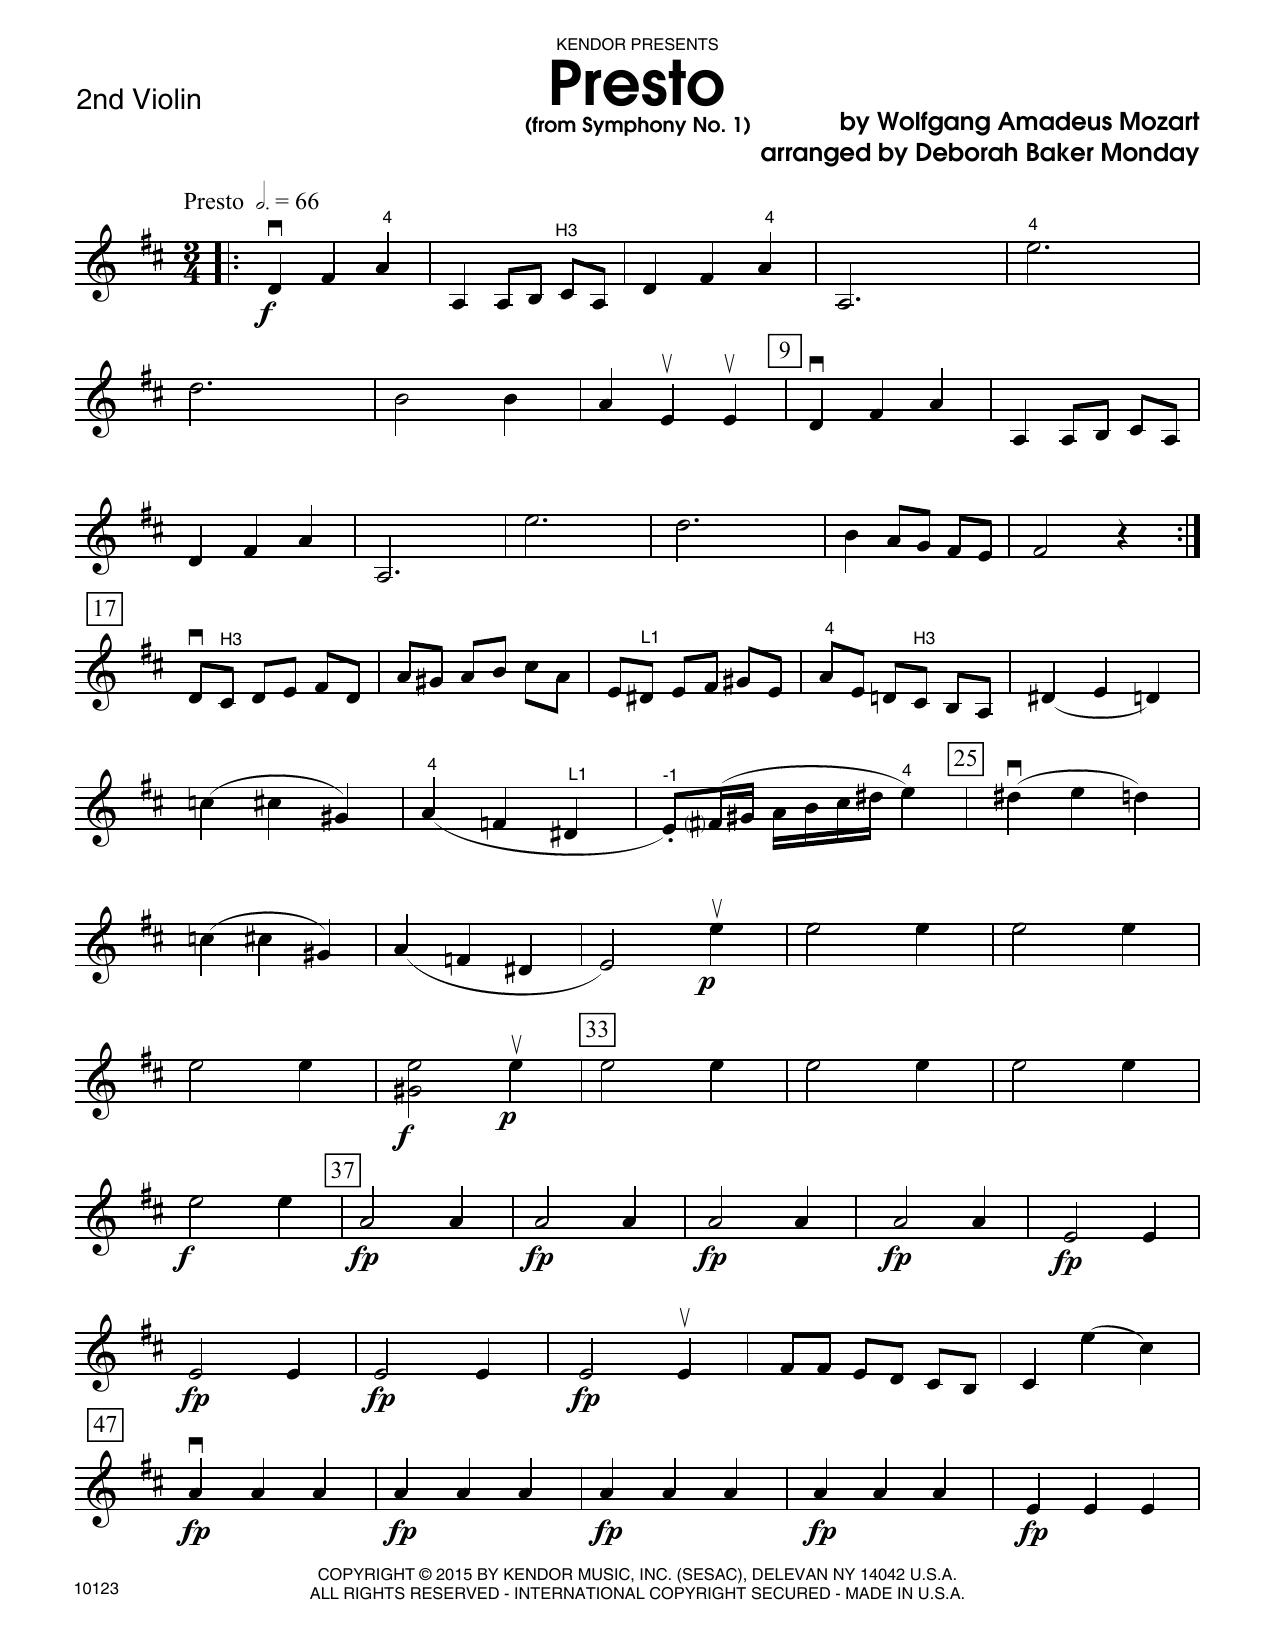 Mozart - Presto (from Symphony No. 1) - 2nd Violin